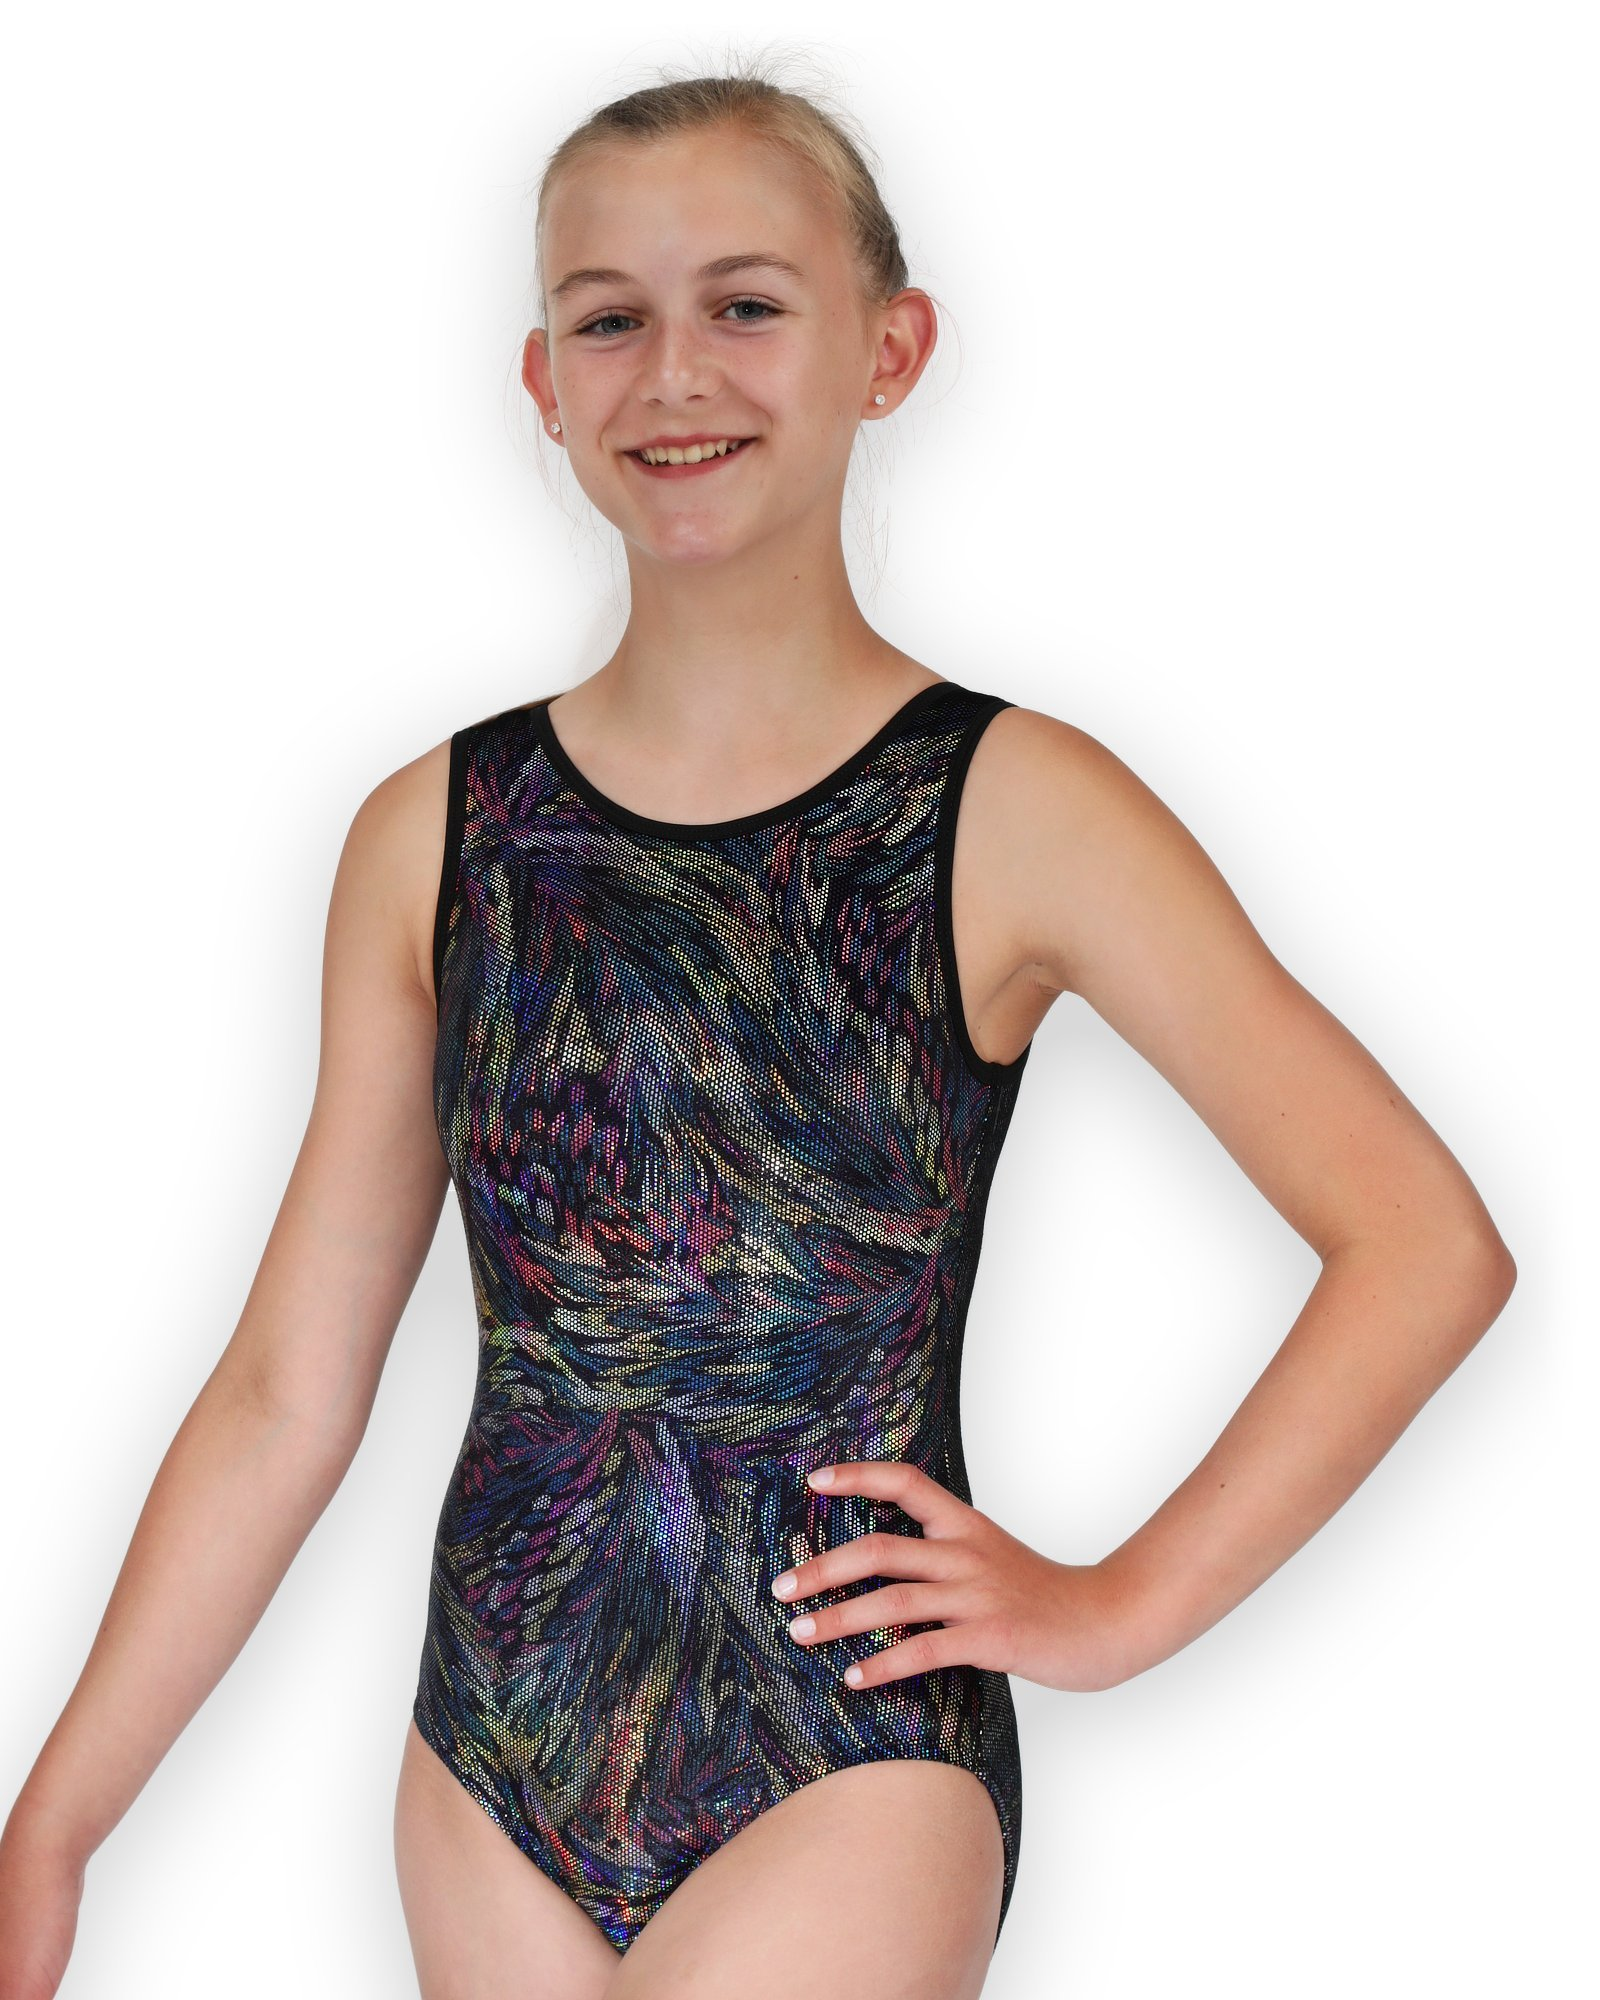 Pelle Gymnastics Leotard for Girls - Black Velvet Feathers - AM